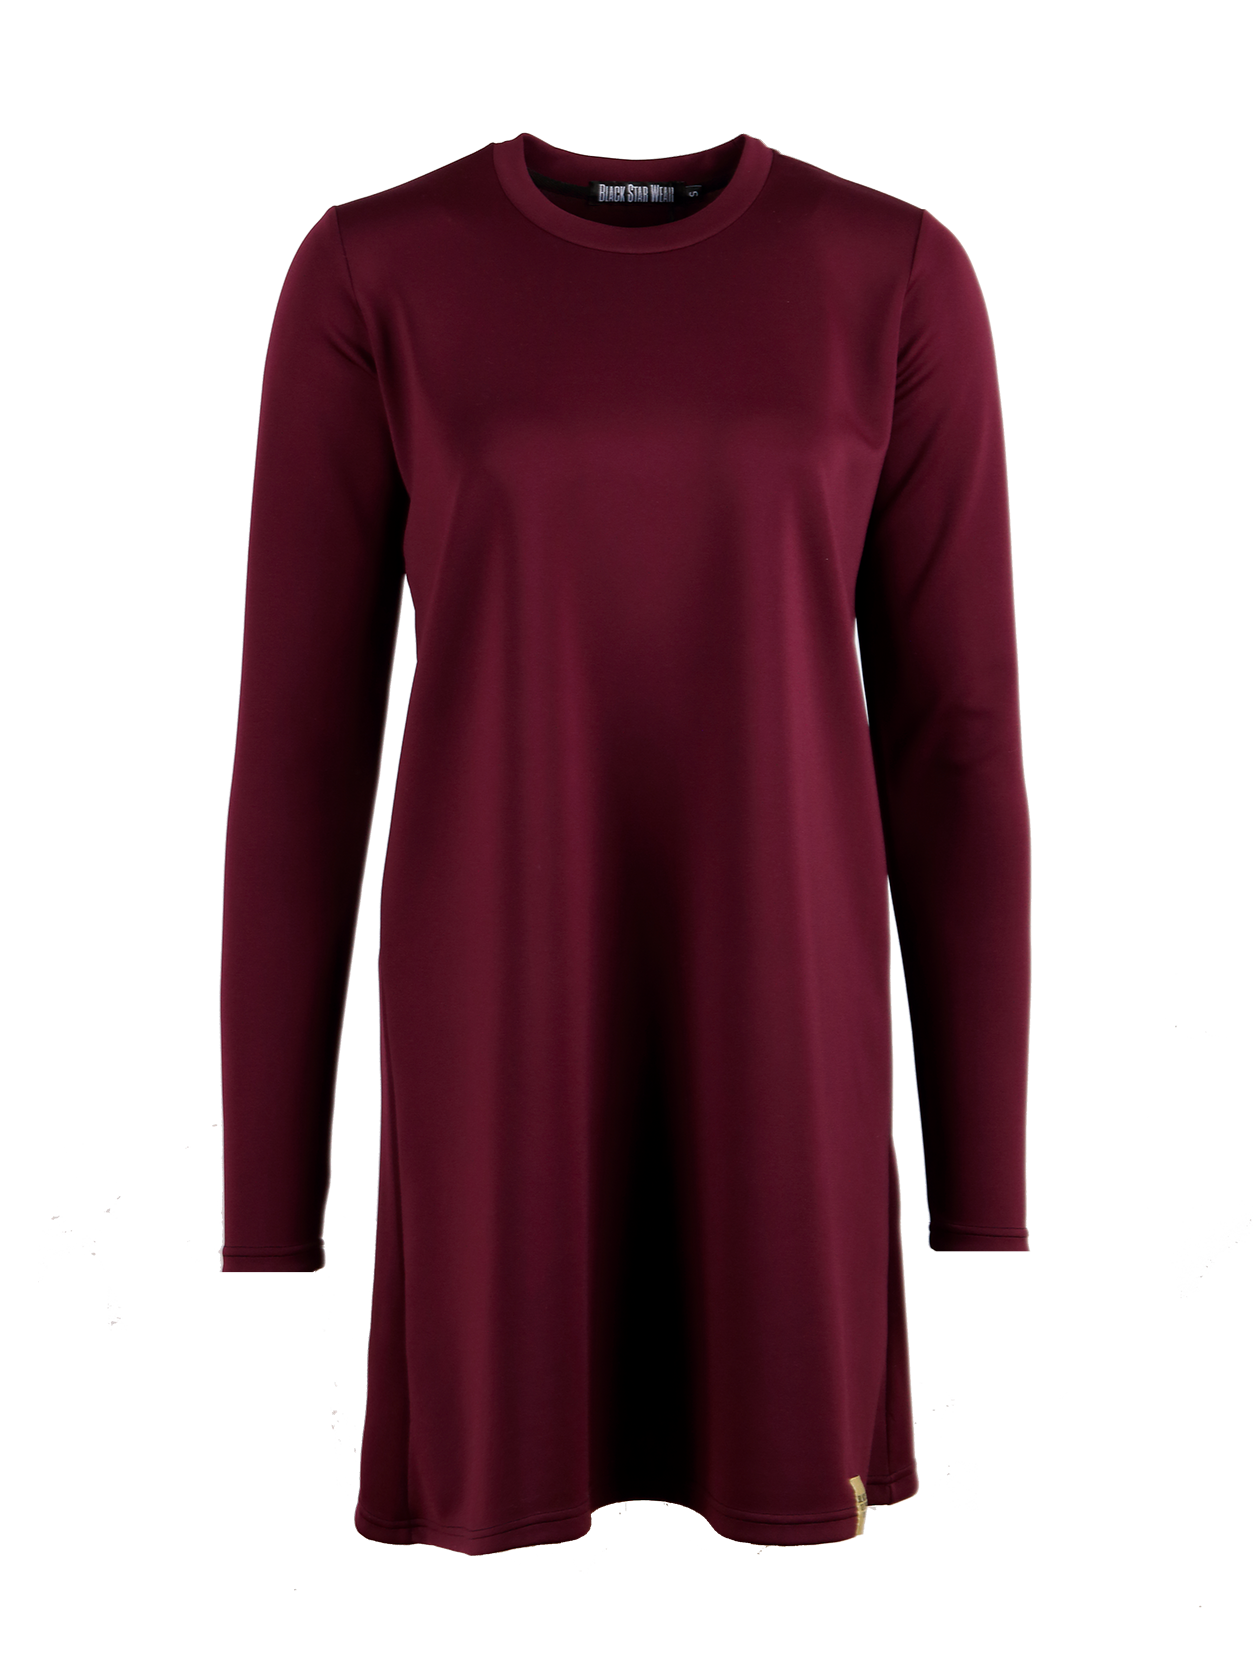 Womens dress SmartRoyal purple dress by Black Star Wear. Long sleeves, o-neck, knee-length. 85% viscose, 15% linen.<br><br>size: M<br>color: Purple<br>gender: female